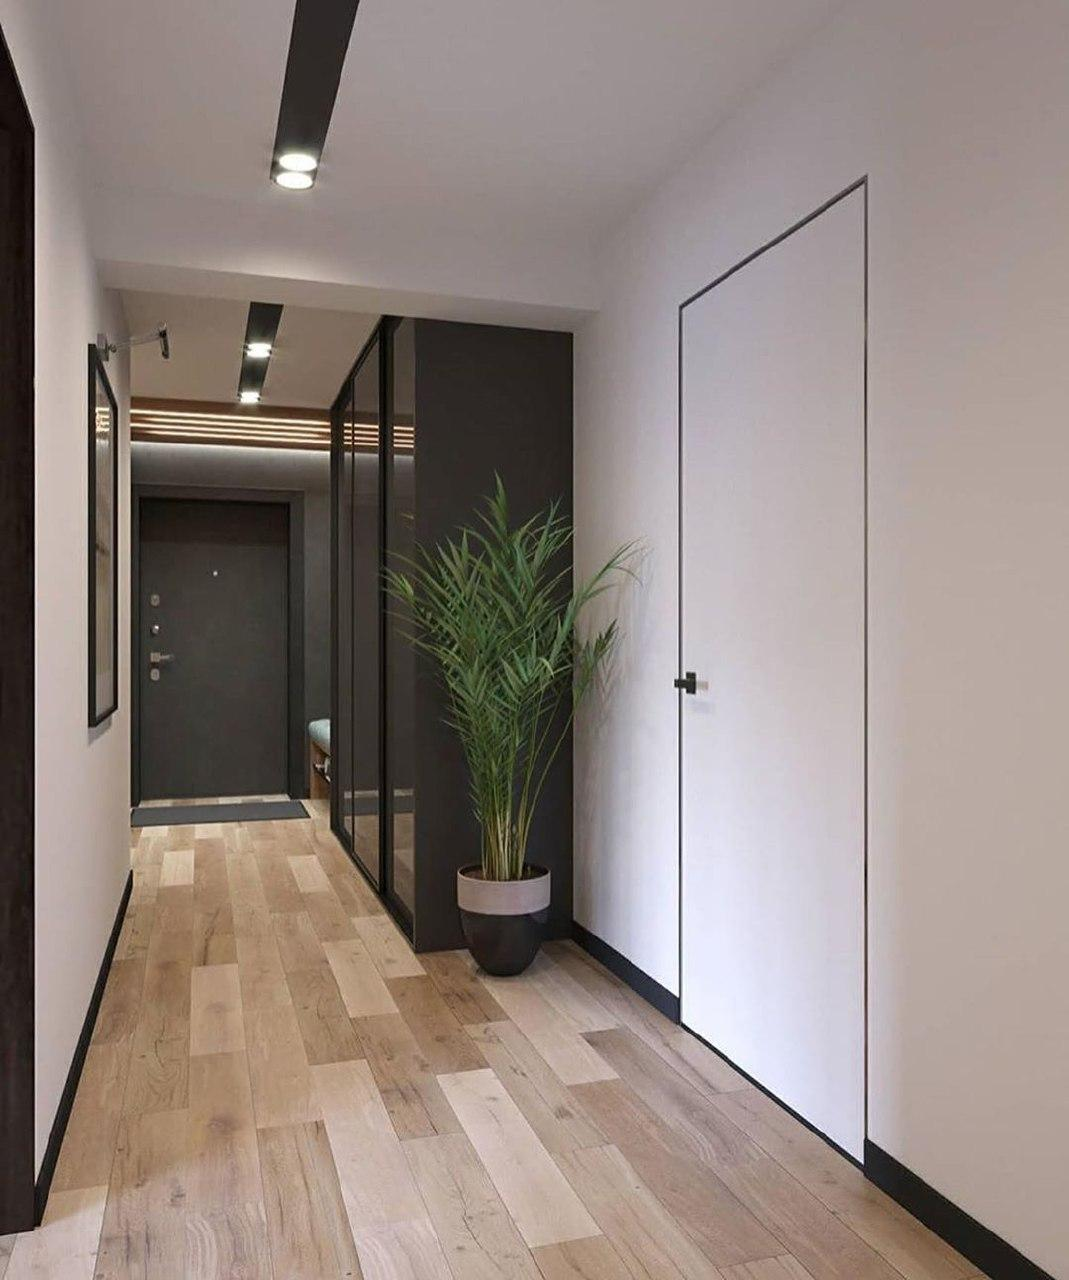 ремонт квартир под ключ в красногорске